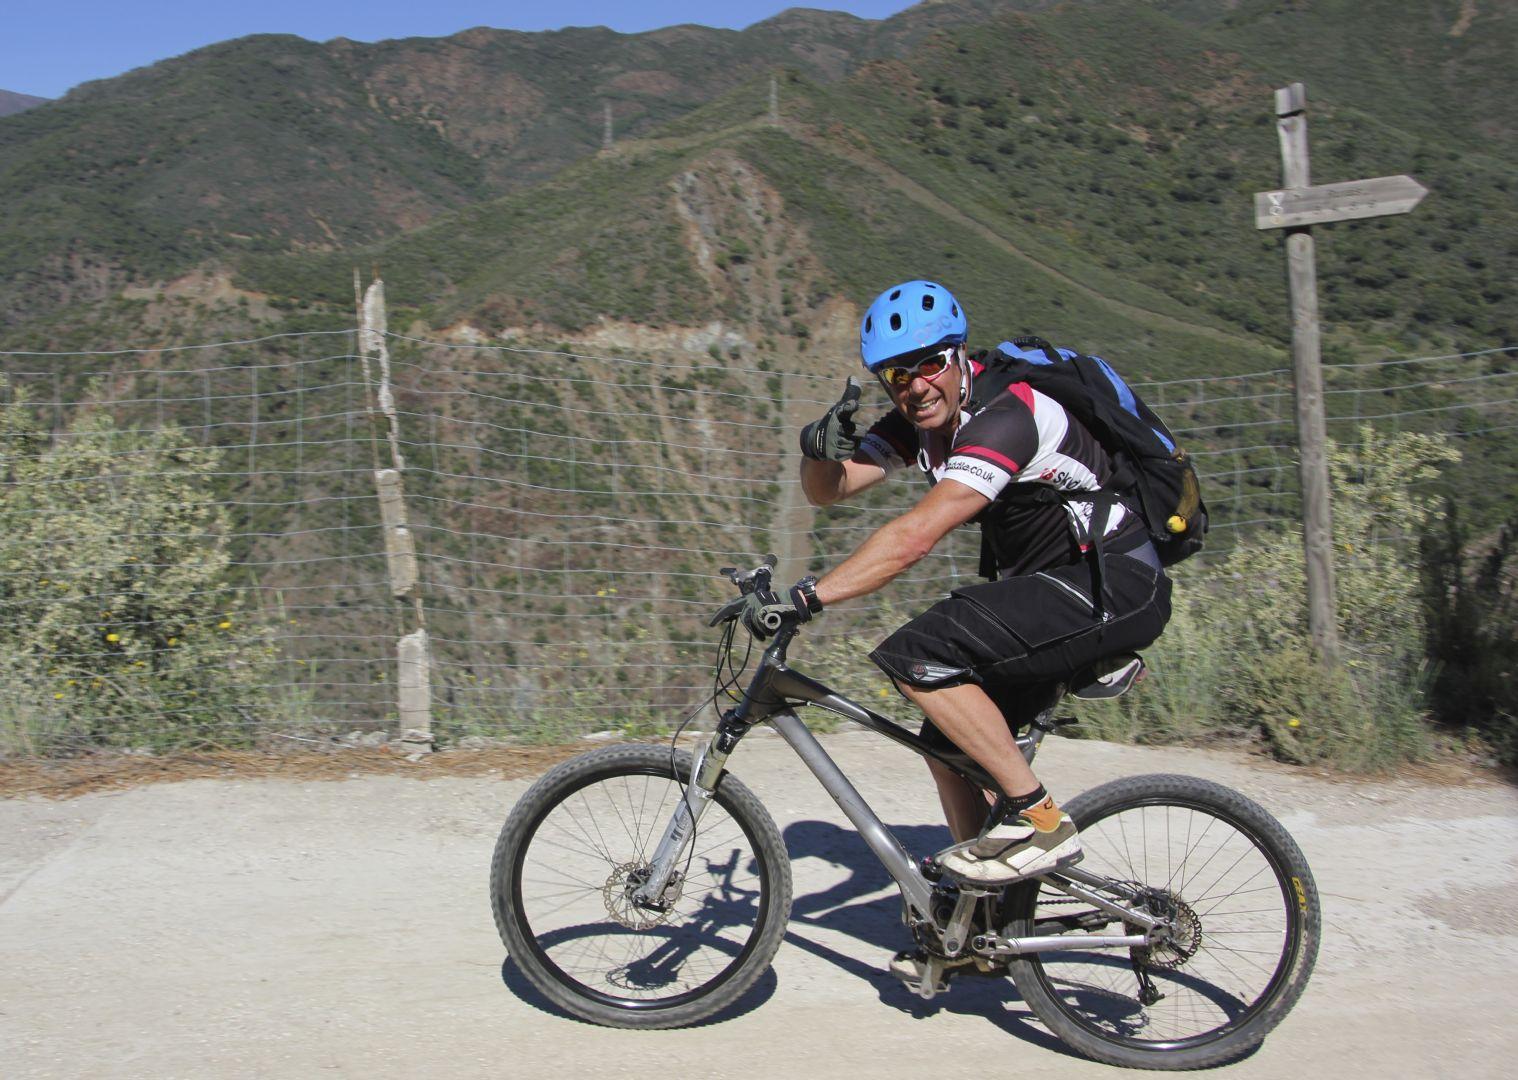 mountainbikingspain9.jpg - Spain - Ruta de la Plata - Guided Mountain Bike Holiday - Mountain Biking